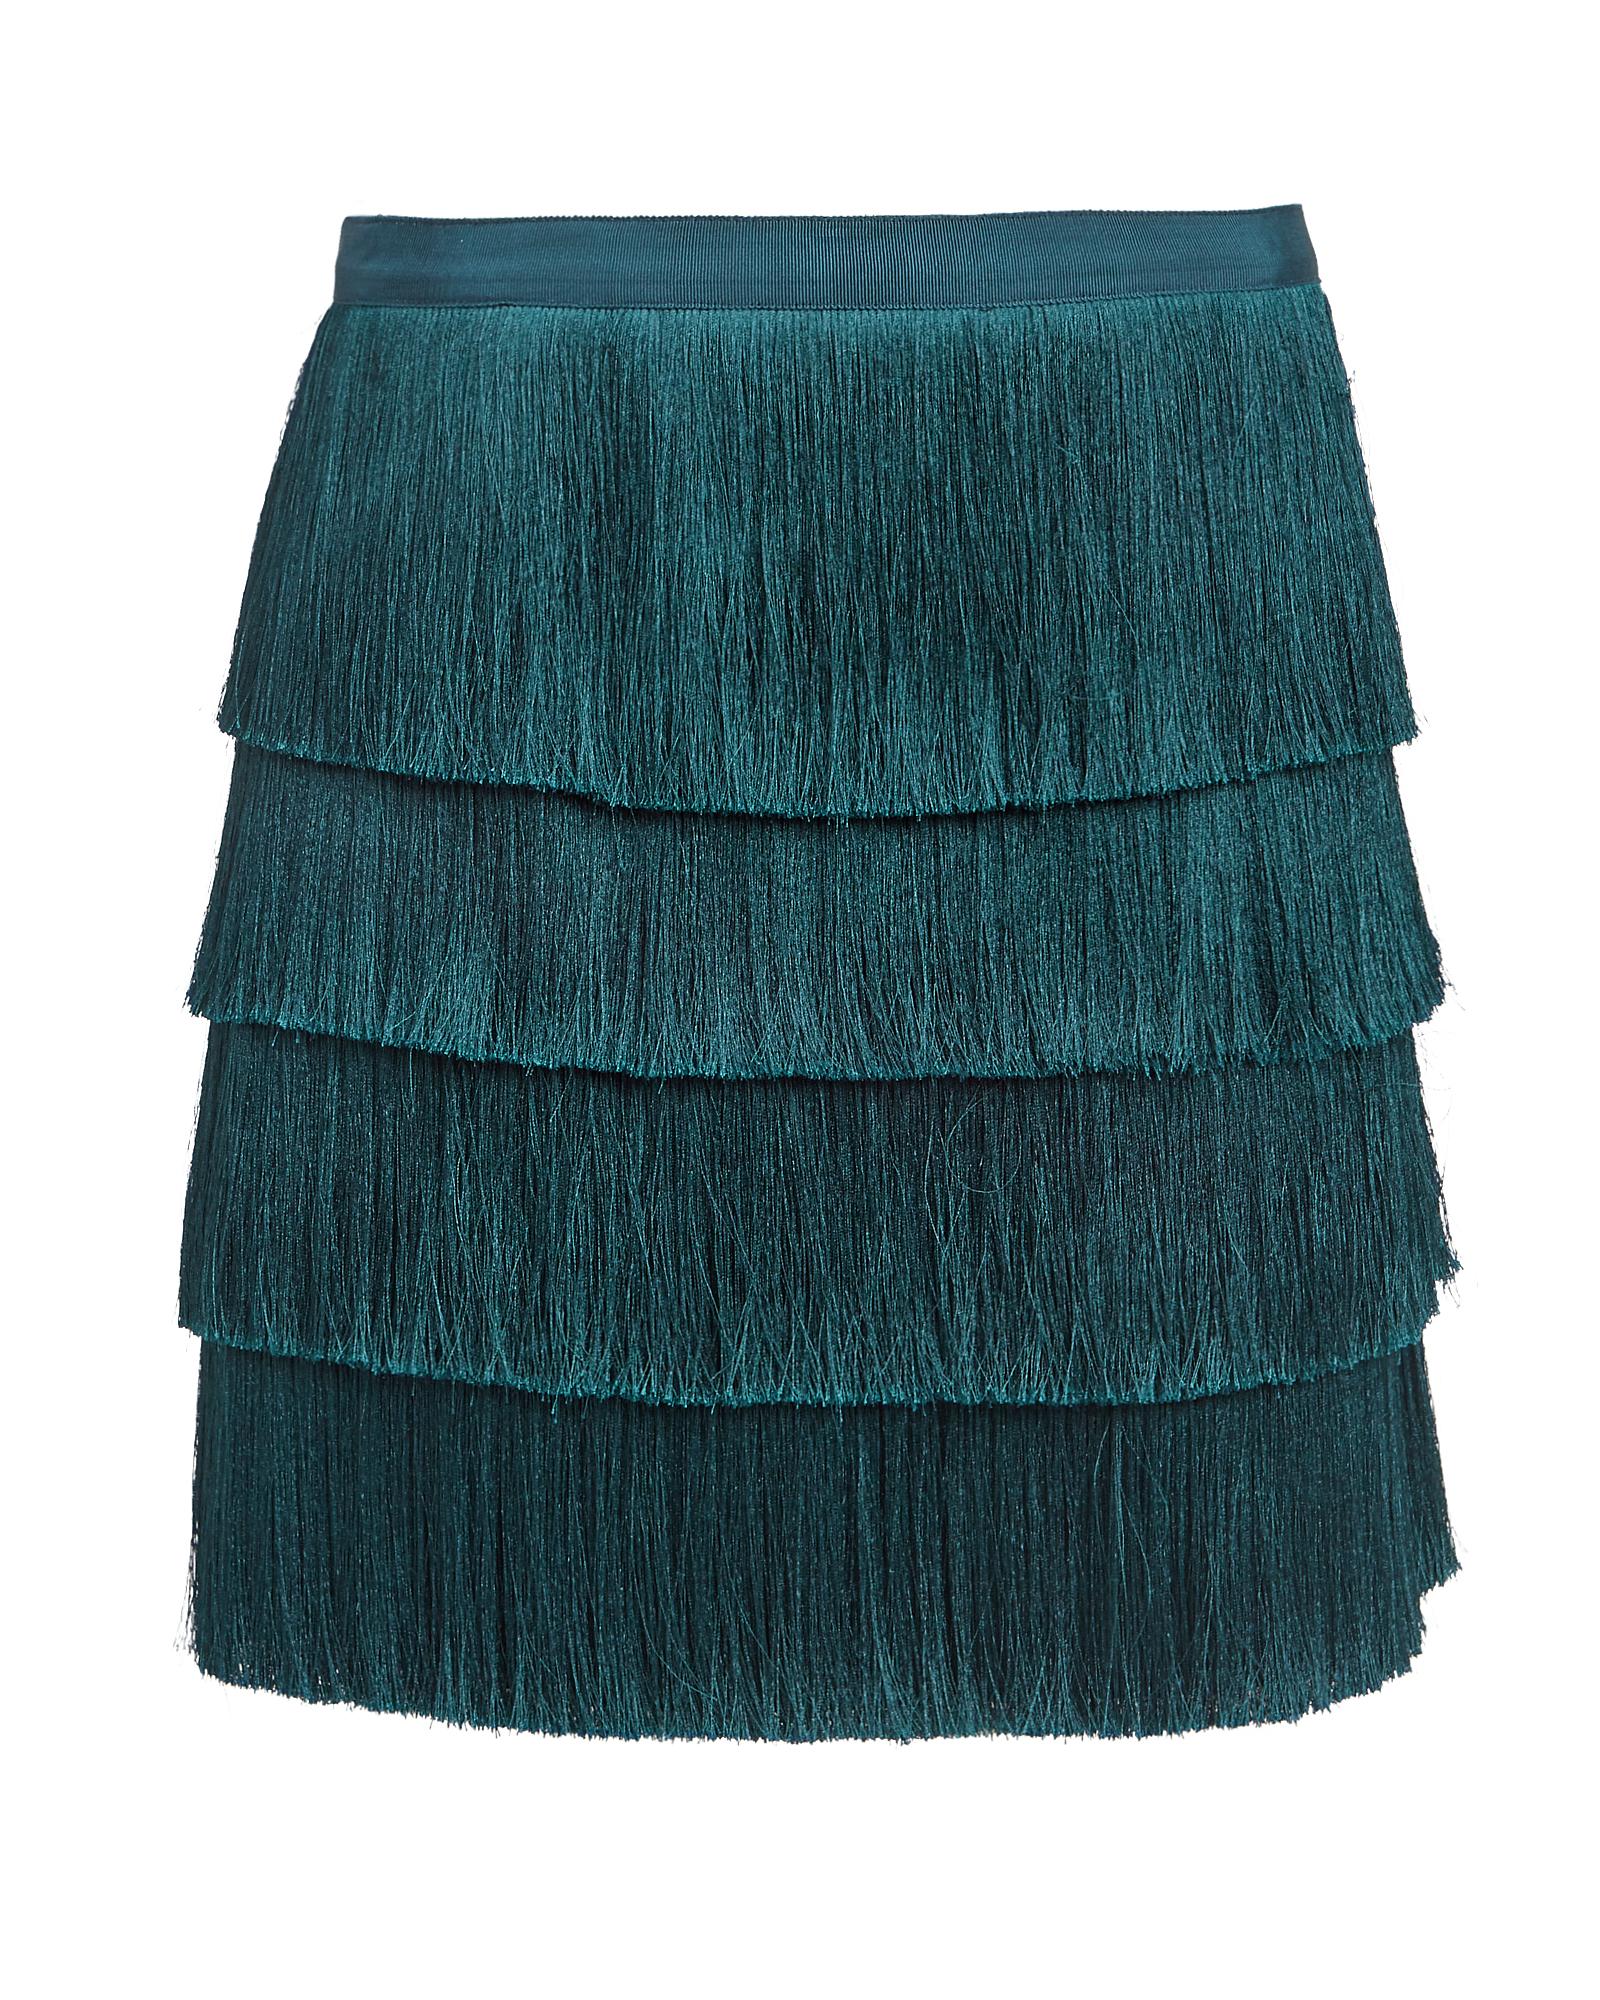 Intermix Raine Fringe Mini Skirt Teal Blue